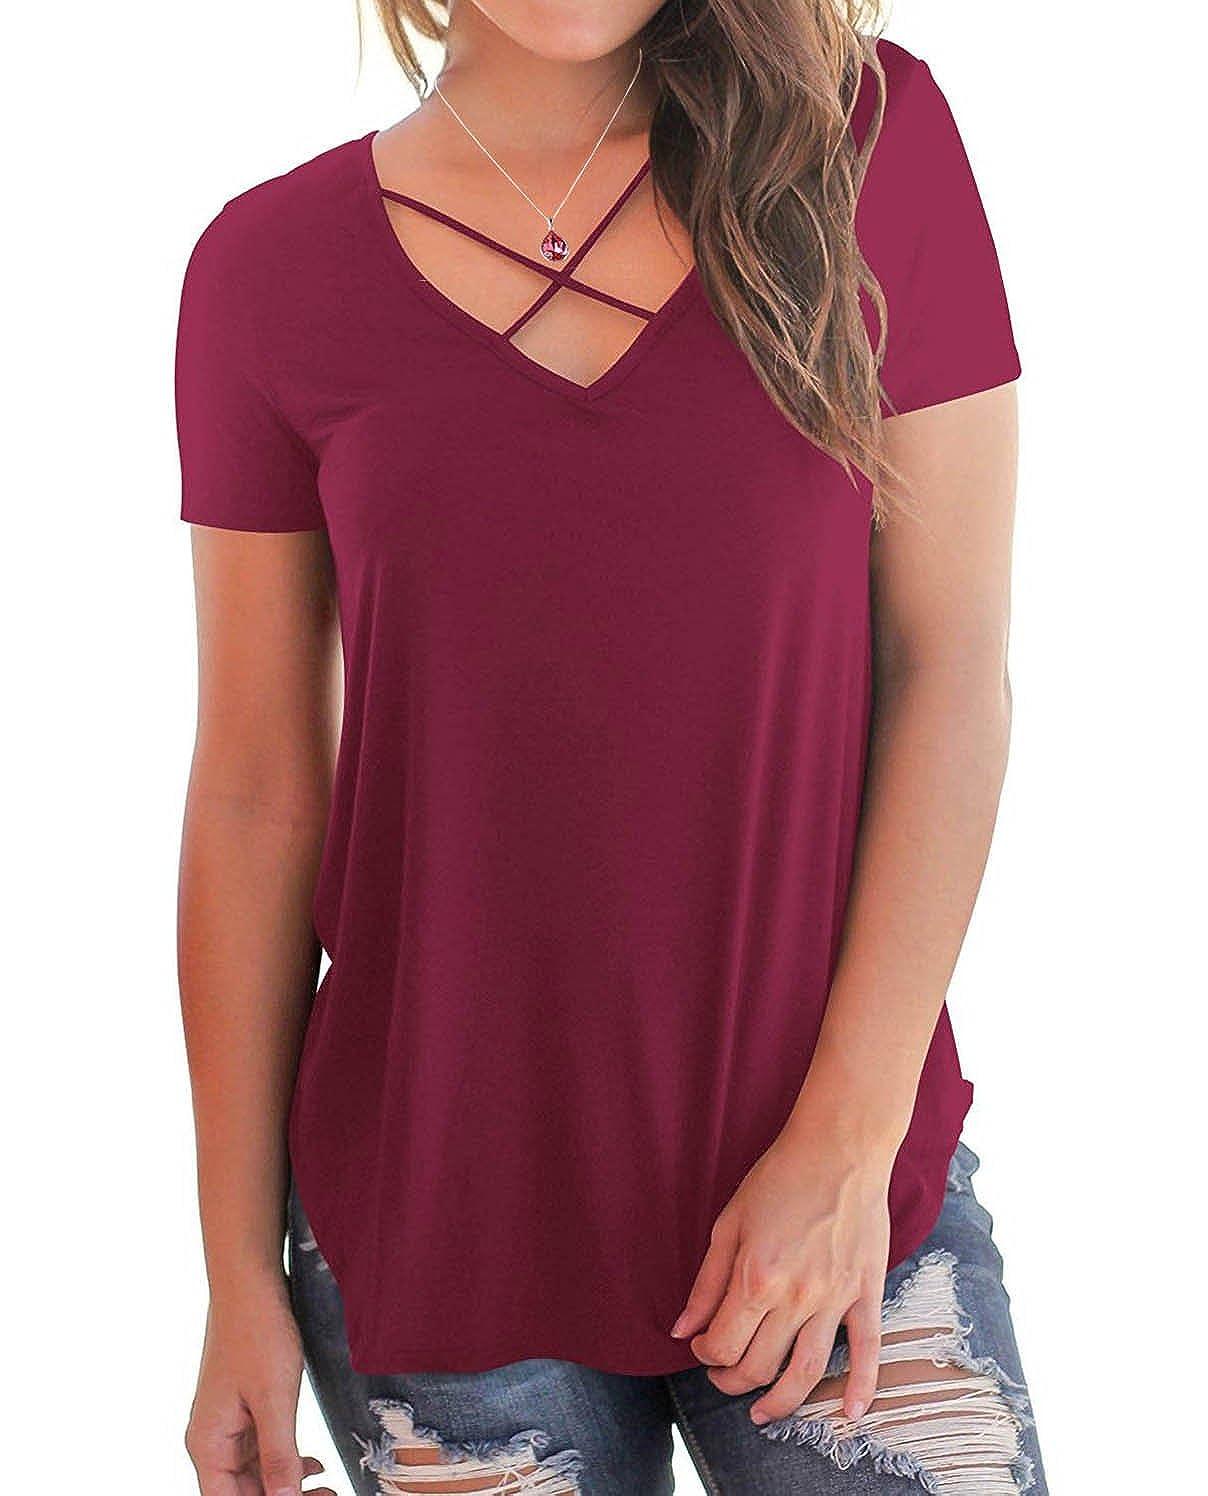 cc17b2796f2 BOBOSMXL Women s Casual Short Sleeve Solid Criss Cross Front V-Neck T-Shirt  Blouse Tops at Amazon Women s Clothing store